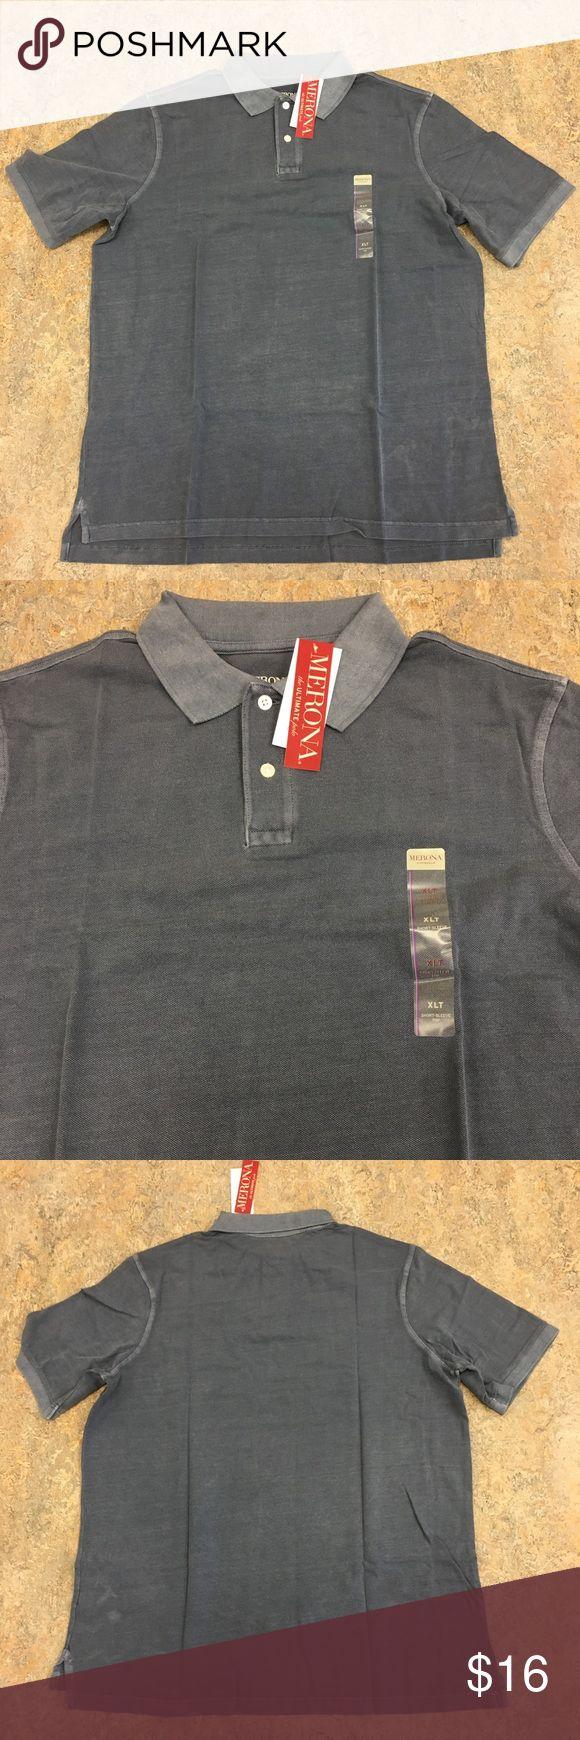 Merona Ultimate Blue Button Up XLT Polo Shirt Merona Blue Pique Button Up Ultimate Polo Shirt. Size XLT. Merona Shirts Polos